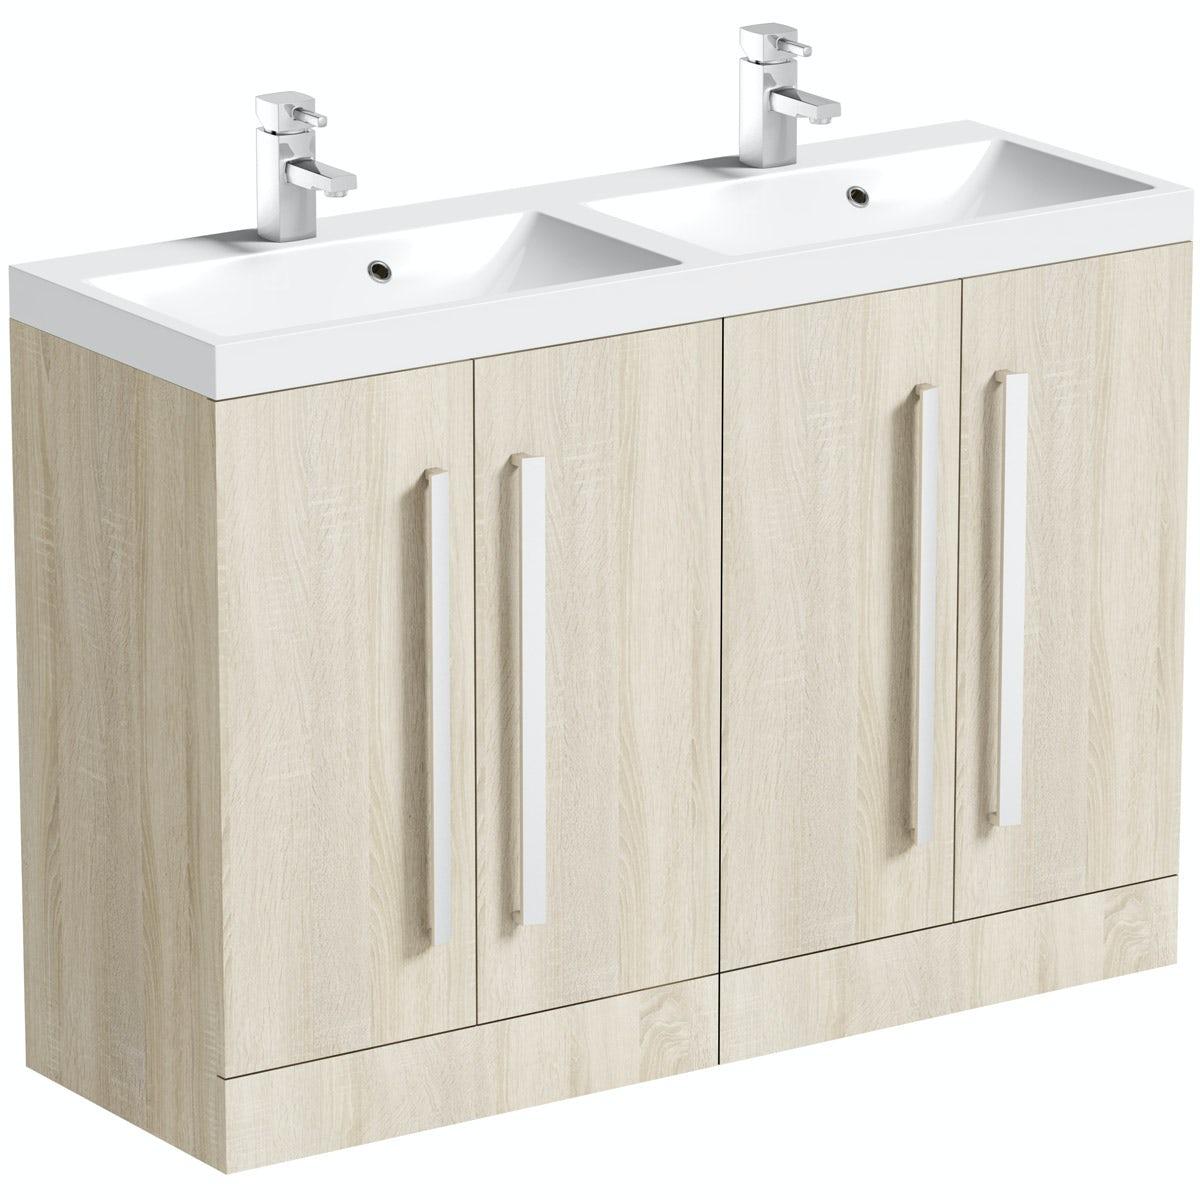 Orchard Wye oak double basin unit 1200mm